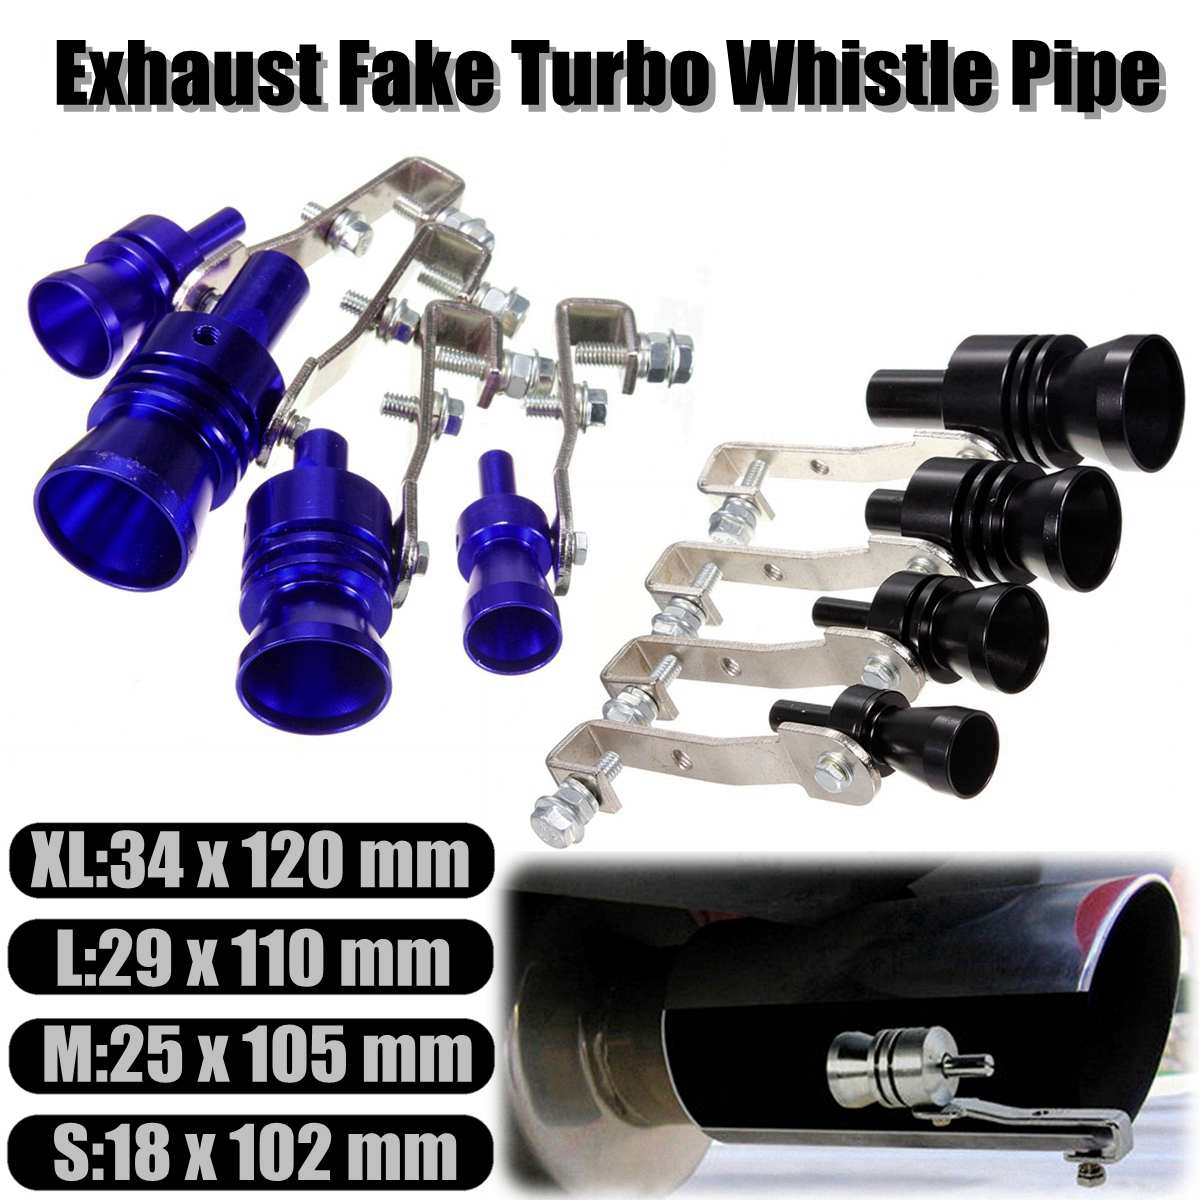 Car Vehicle Motorbike Aluminum Exhaust Fake Turbo Whistle Pipe Sound Muffler Blow Off Valve S/M/L/XL Universal